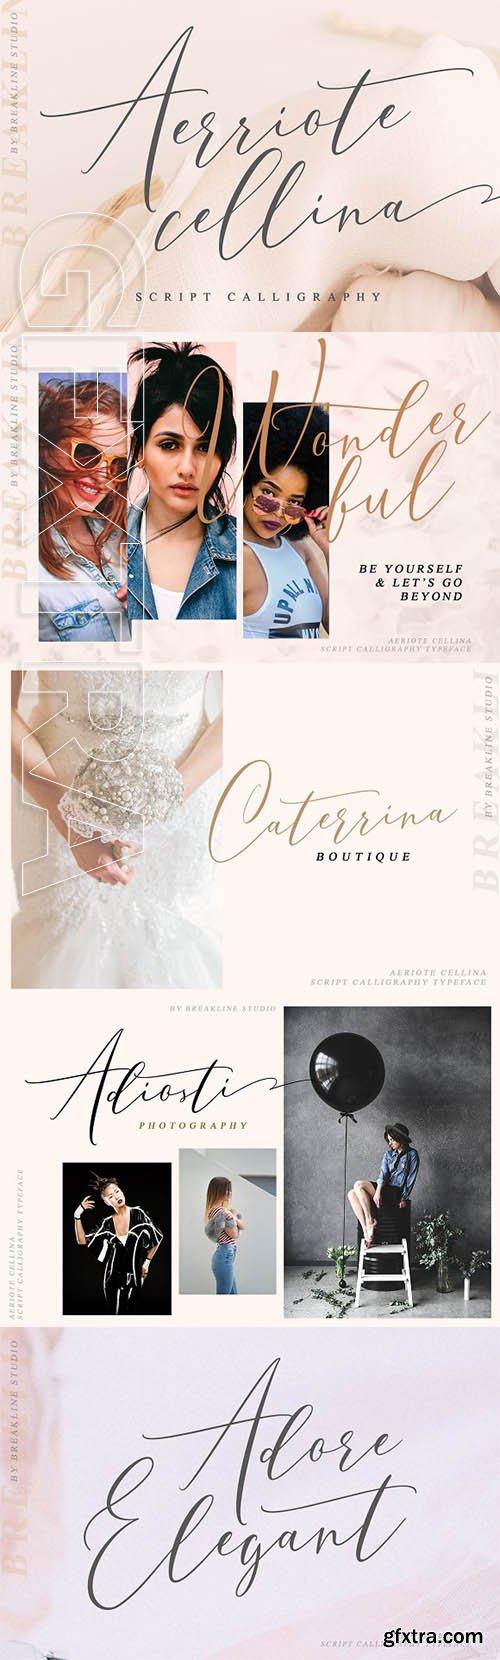 CreativeMarket - Aerriote Cellina 3050803